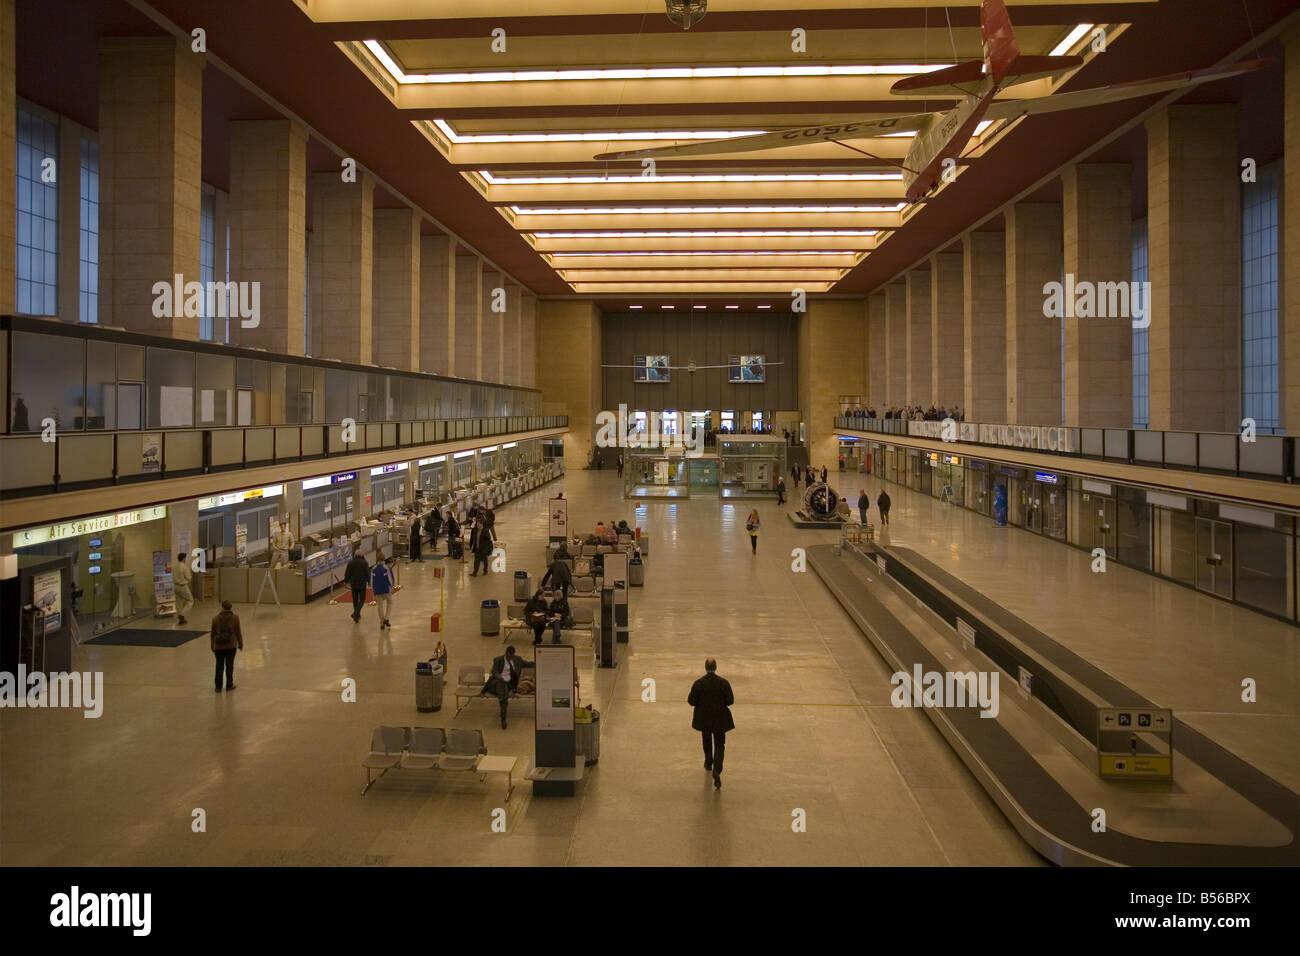 Tempelhof Airport, Berlin, Germany - Stock Image